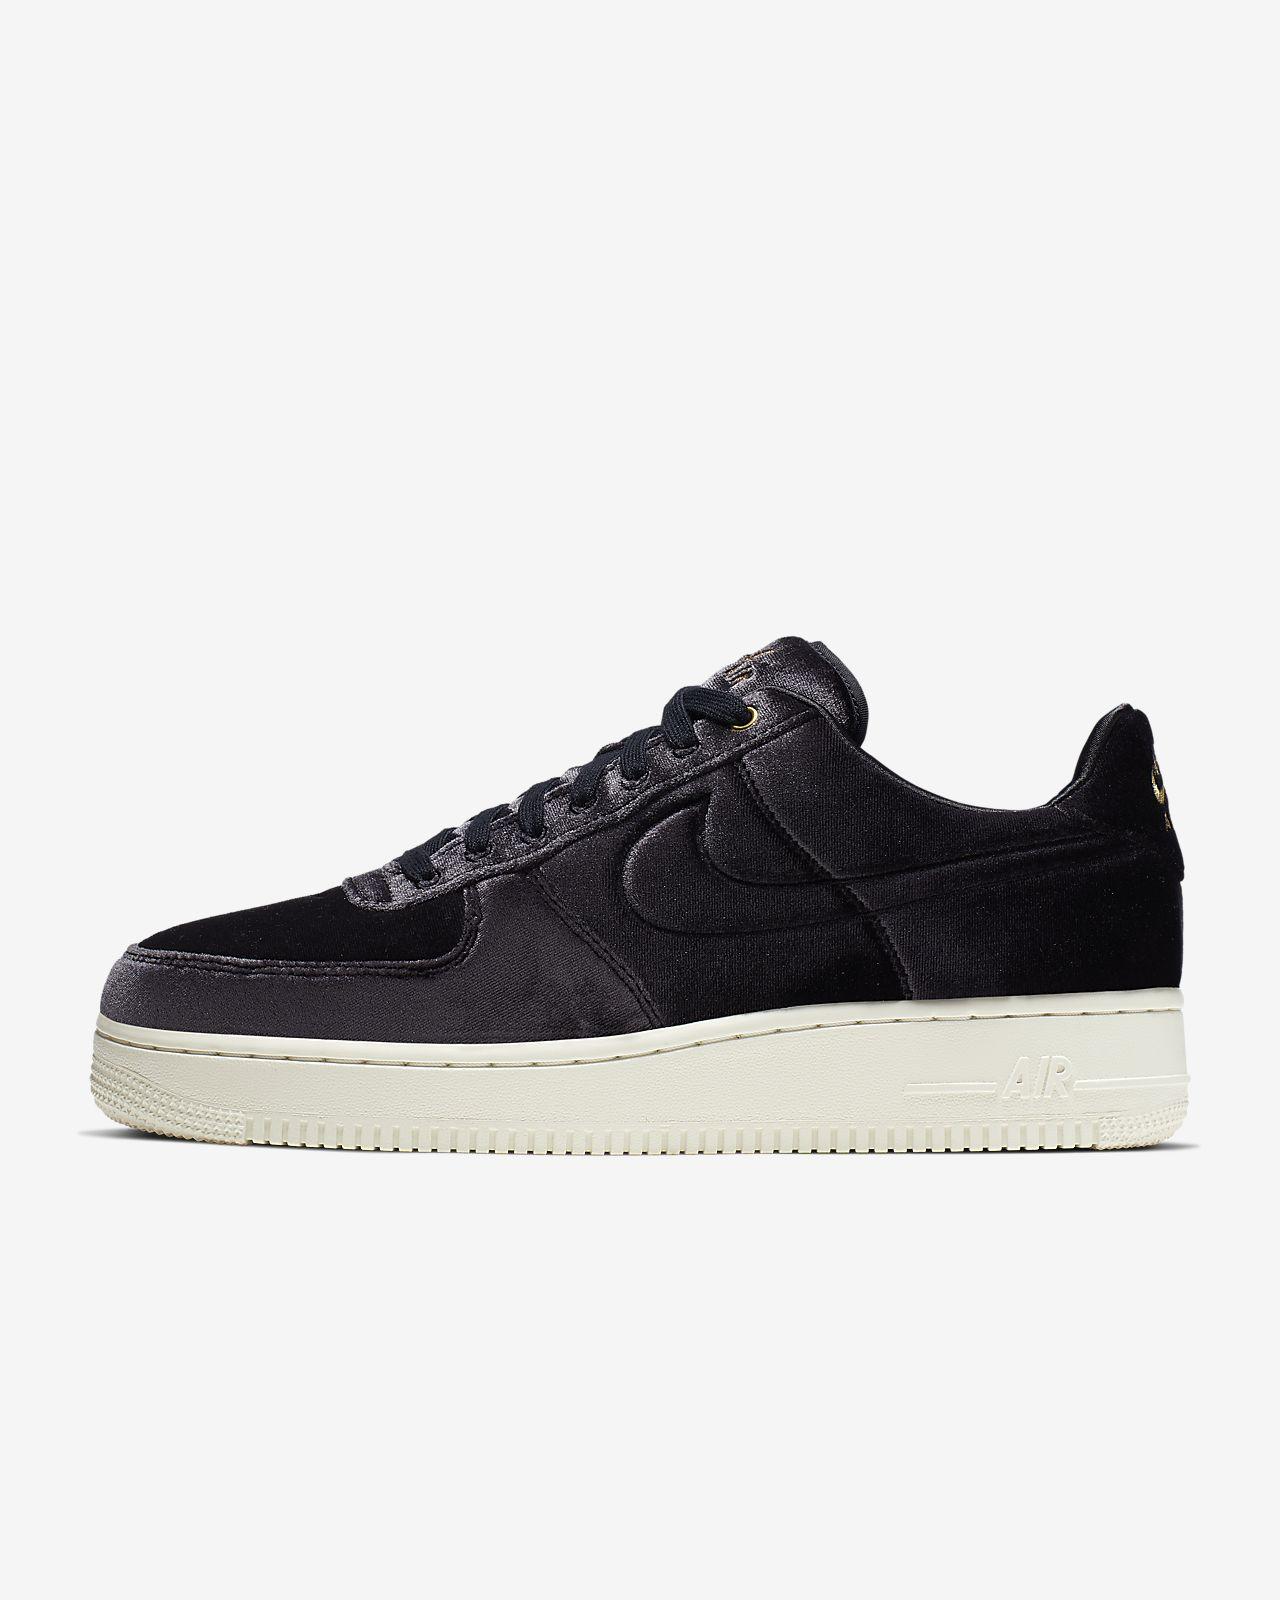 nike air force 1 07 3 chaussure